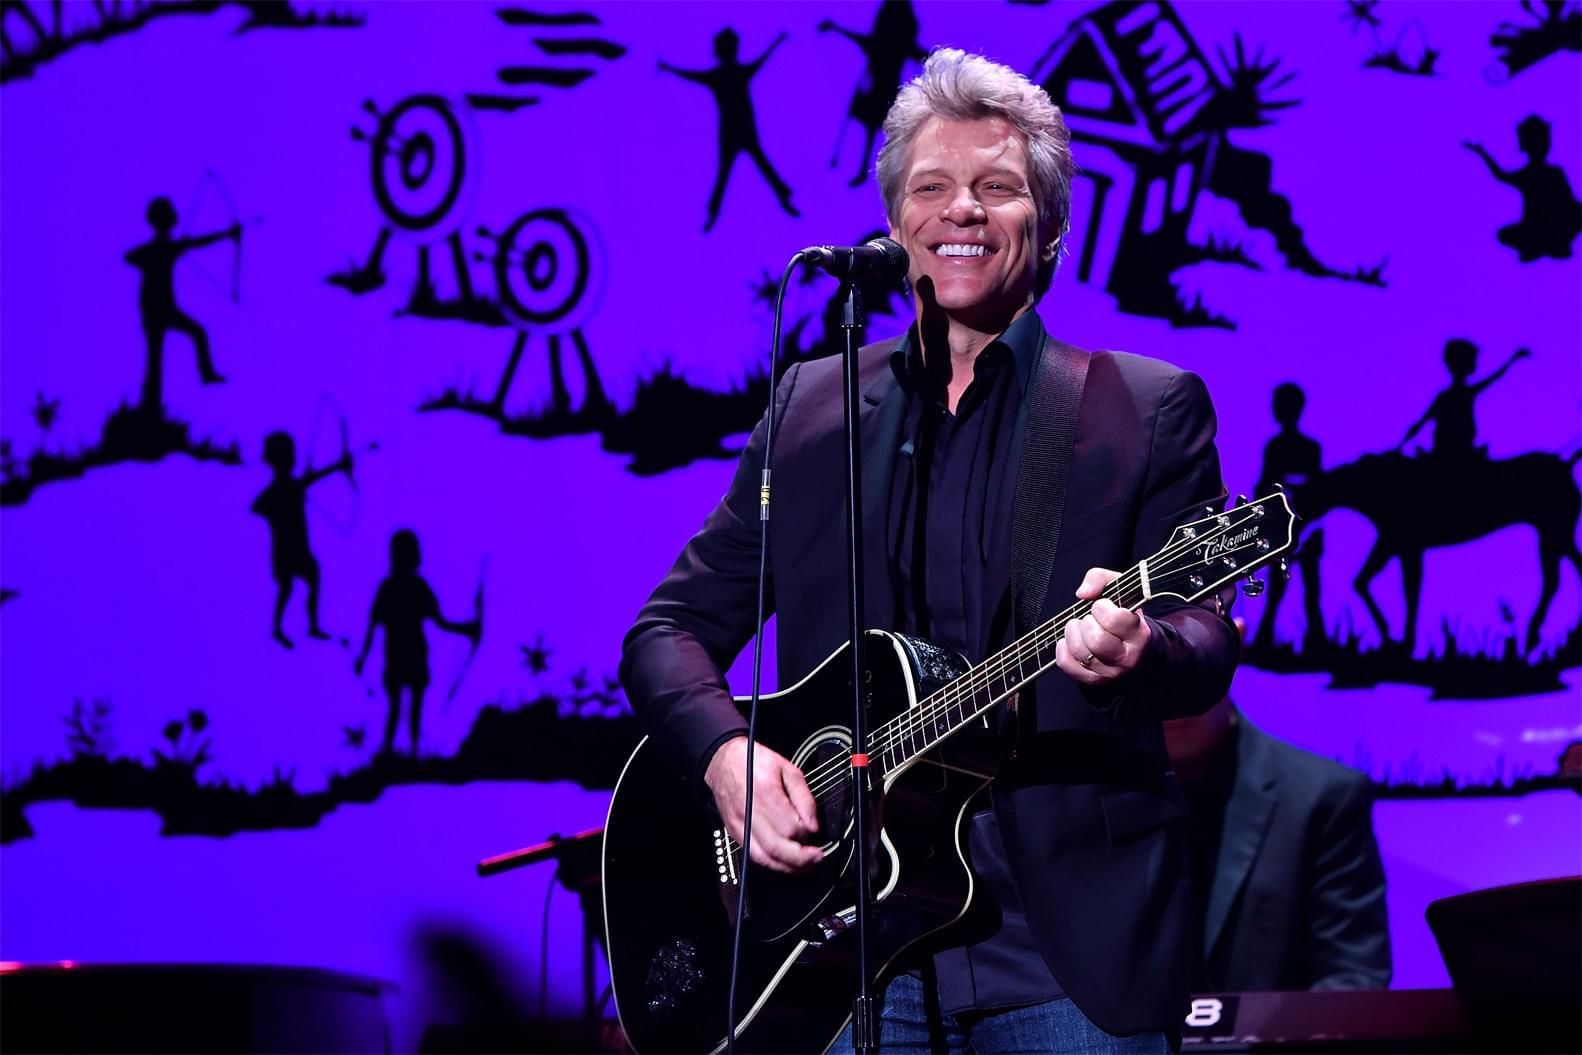 Bon Jovi to perform 'Unbroken' live on 'NBC's Christmas In Rockefeller Center' this Wednesday